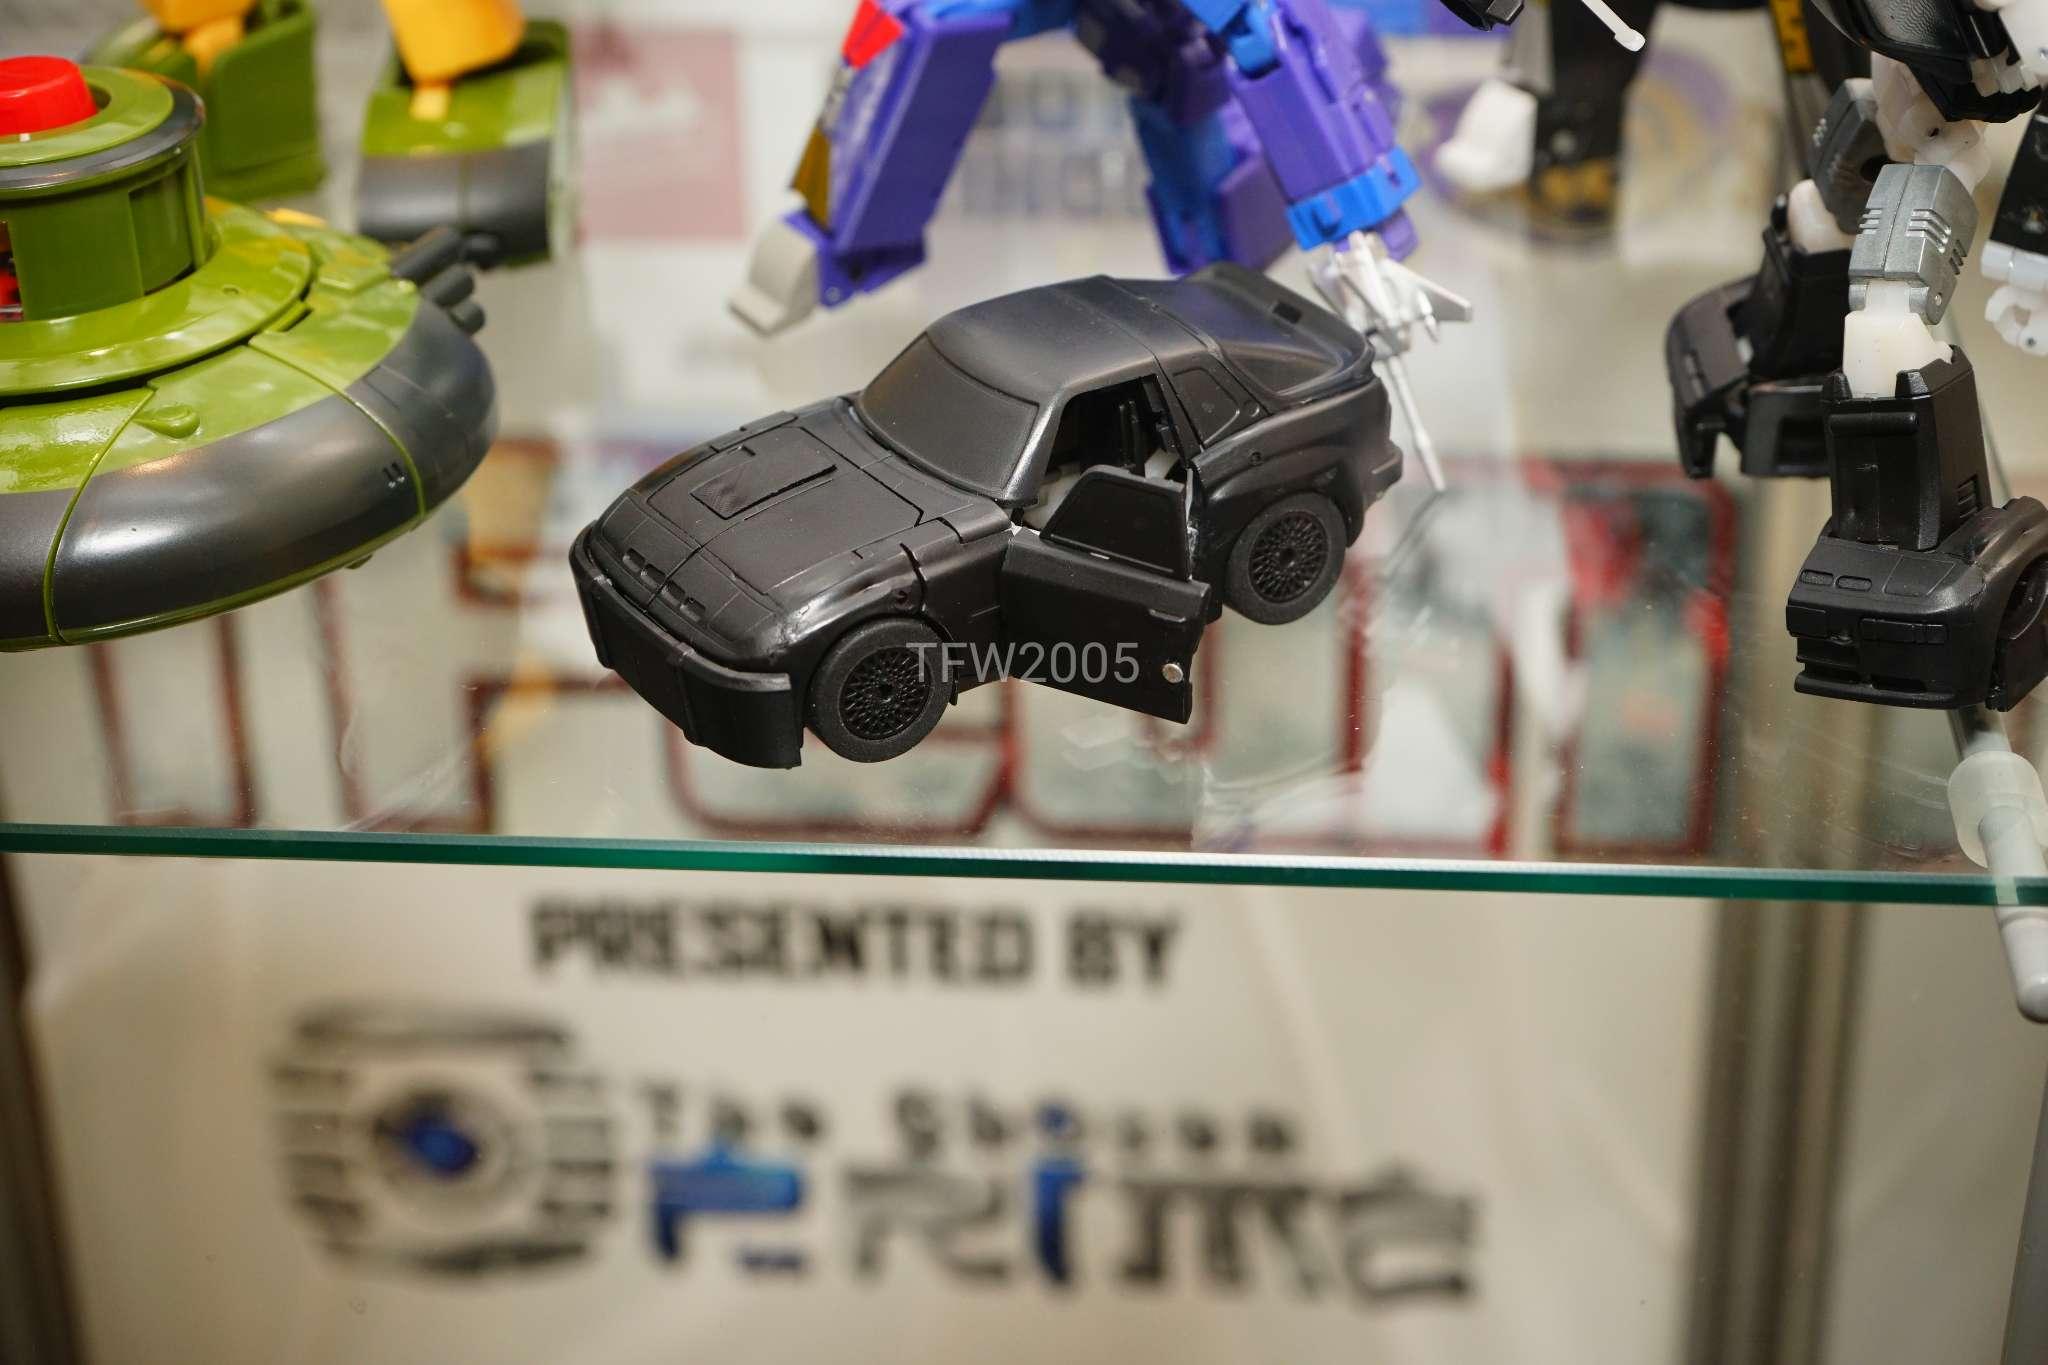 [Ocular Max] Produit Tiers - Minibots MP - PS-09 Hellion (aka Cliffjumper/Matamore), PS-11 Omne - (aka Cosmos) GfIKuSpT_o